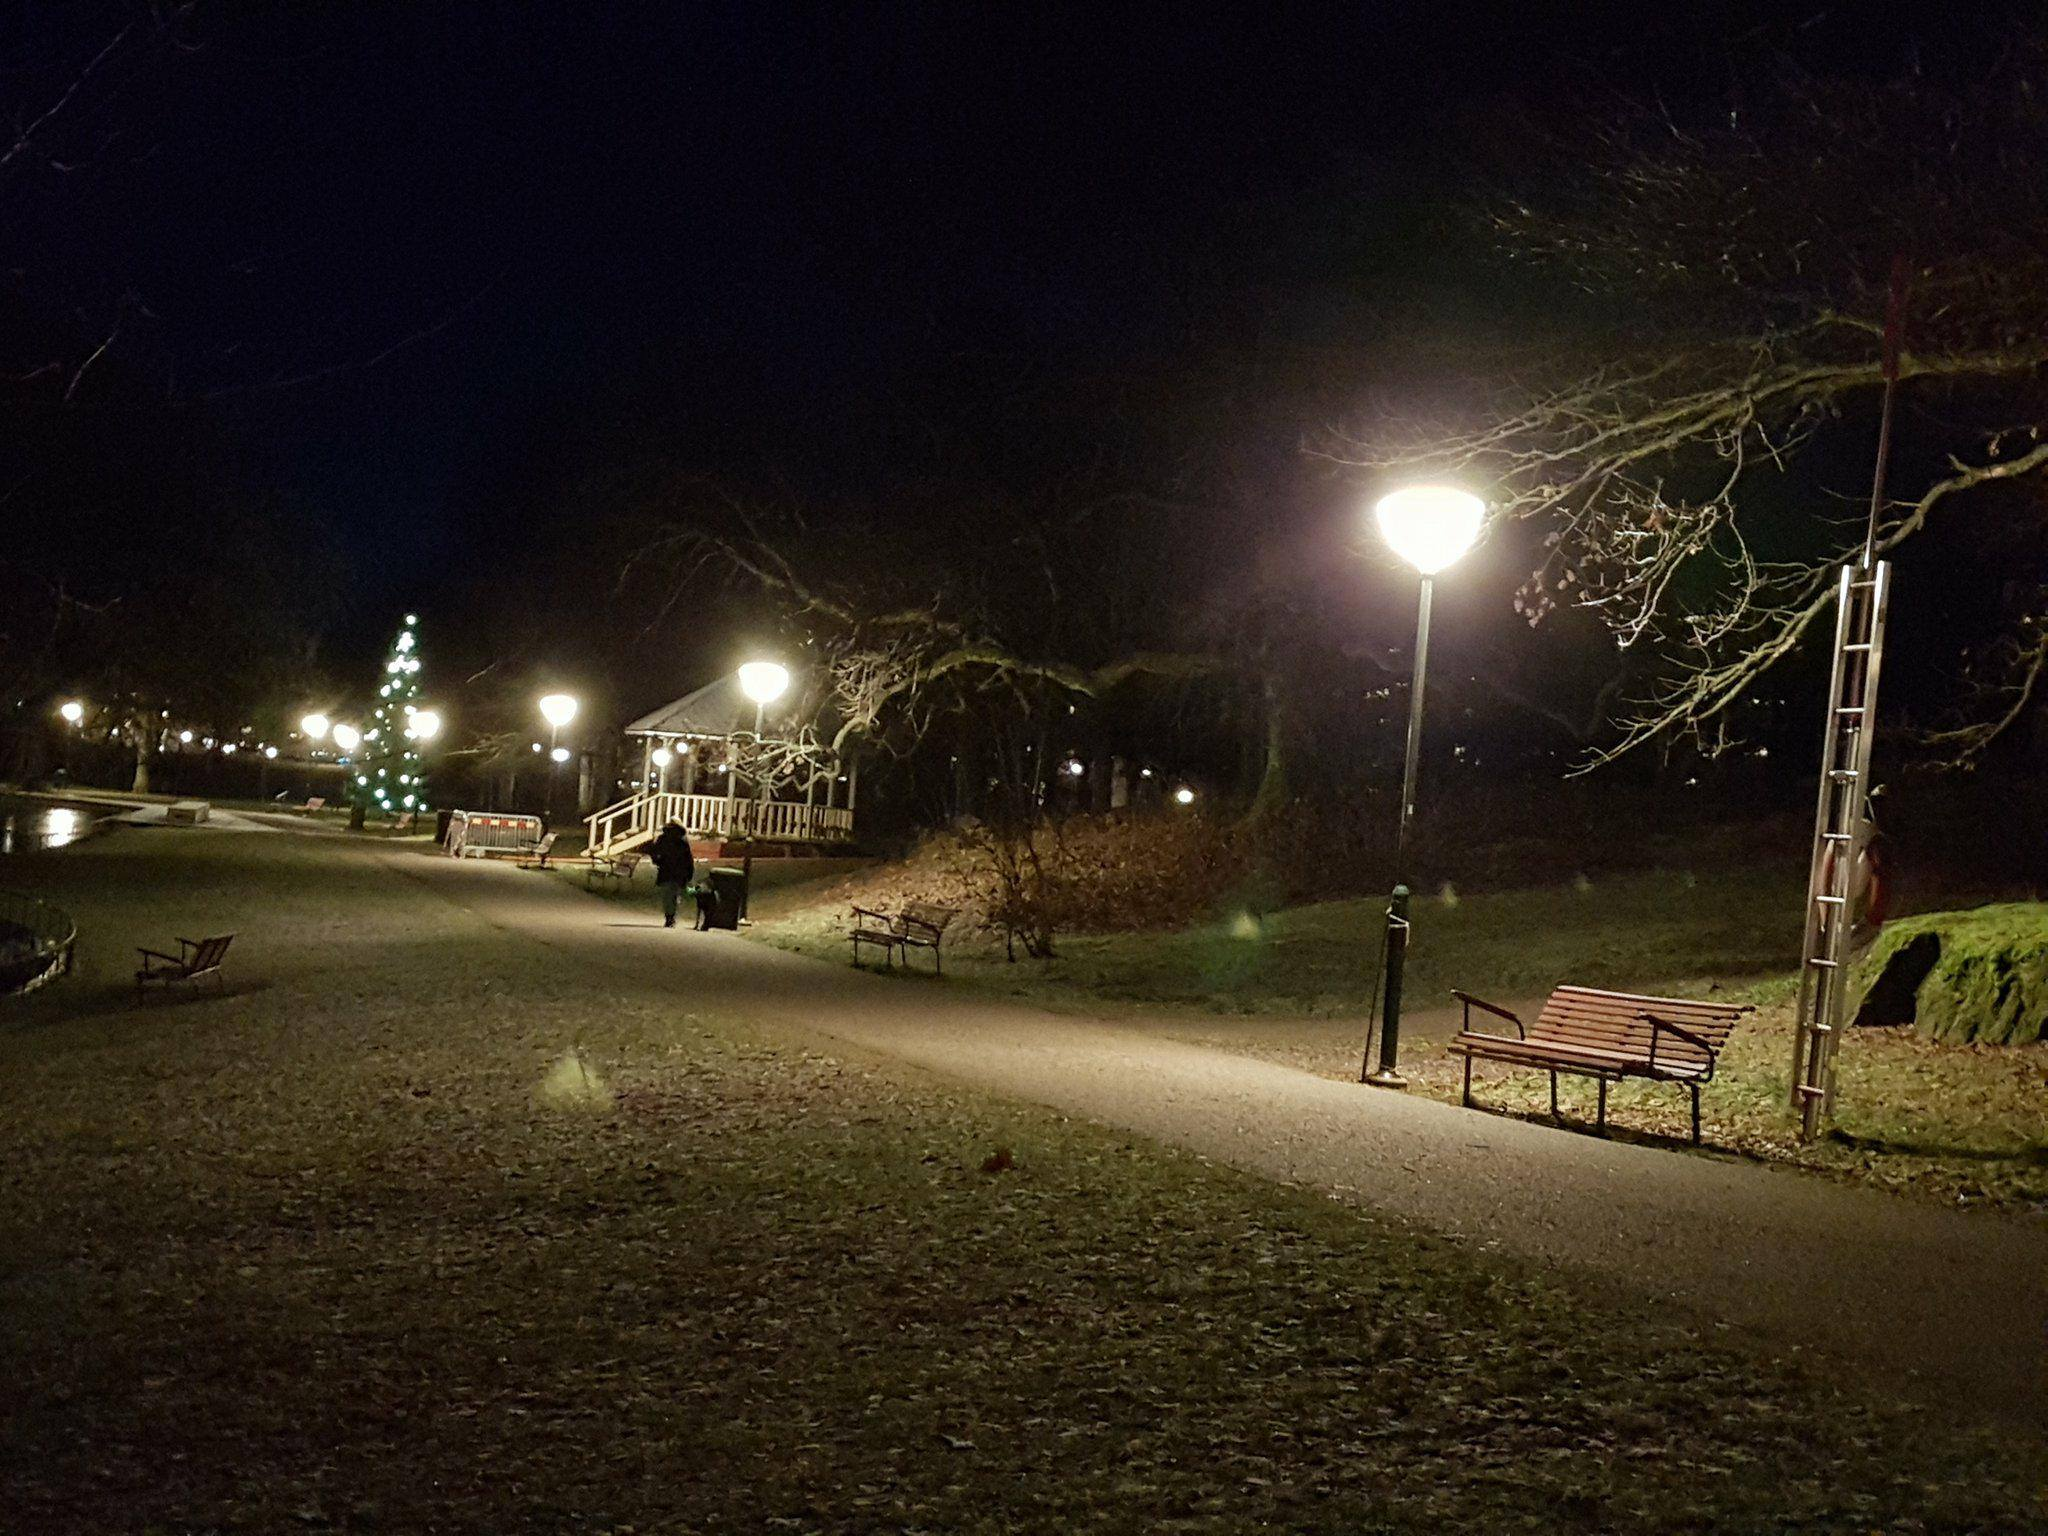 171204 Långbro park 2